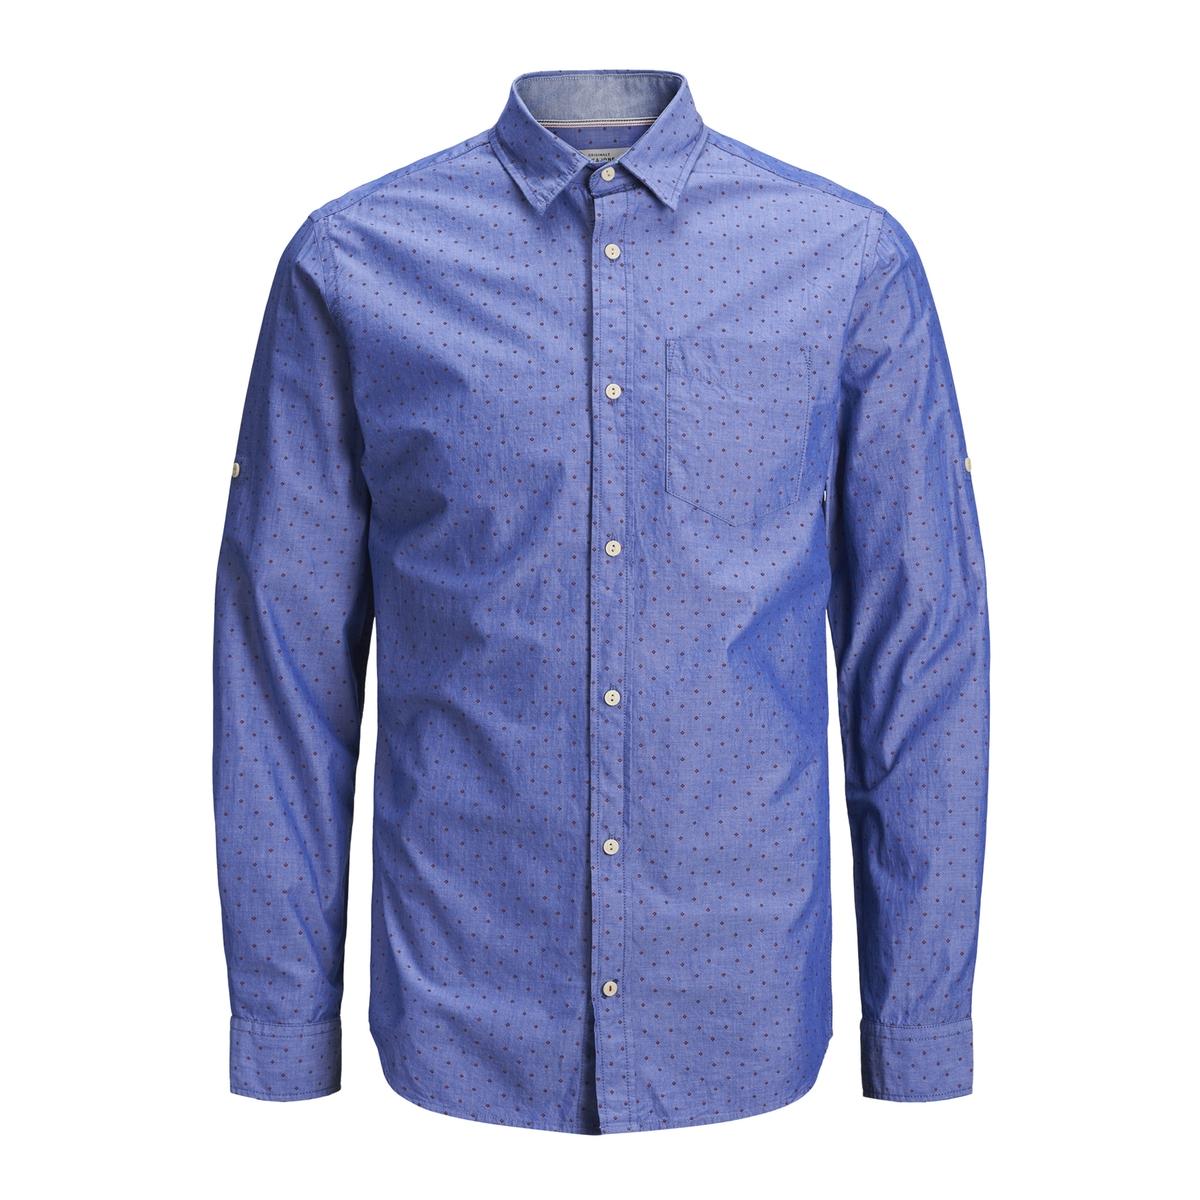 Camisa slim fit Joredward